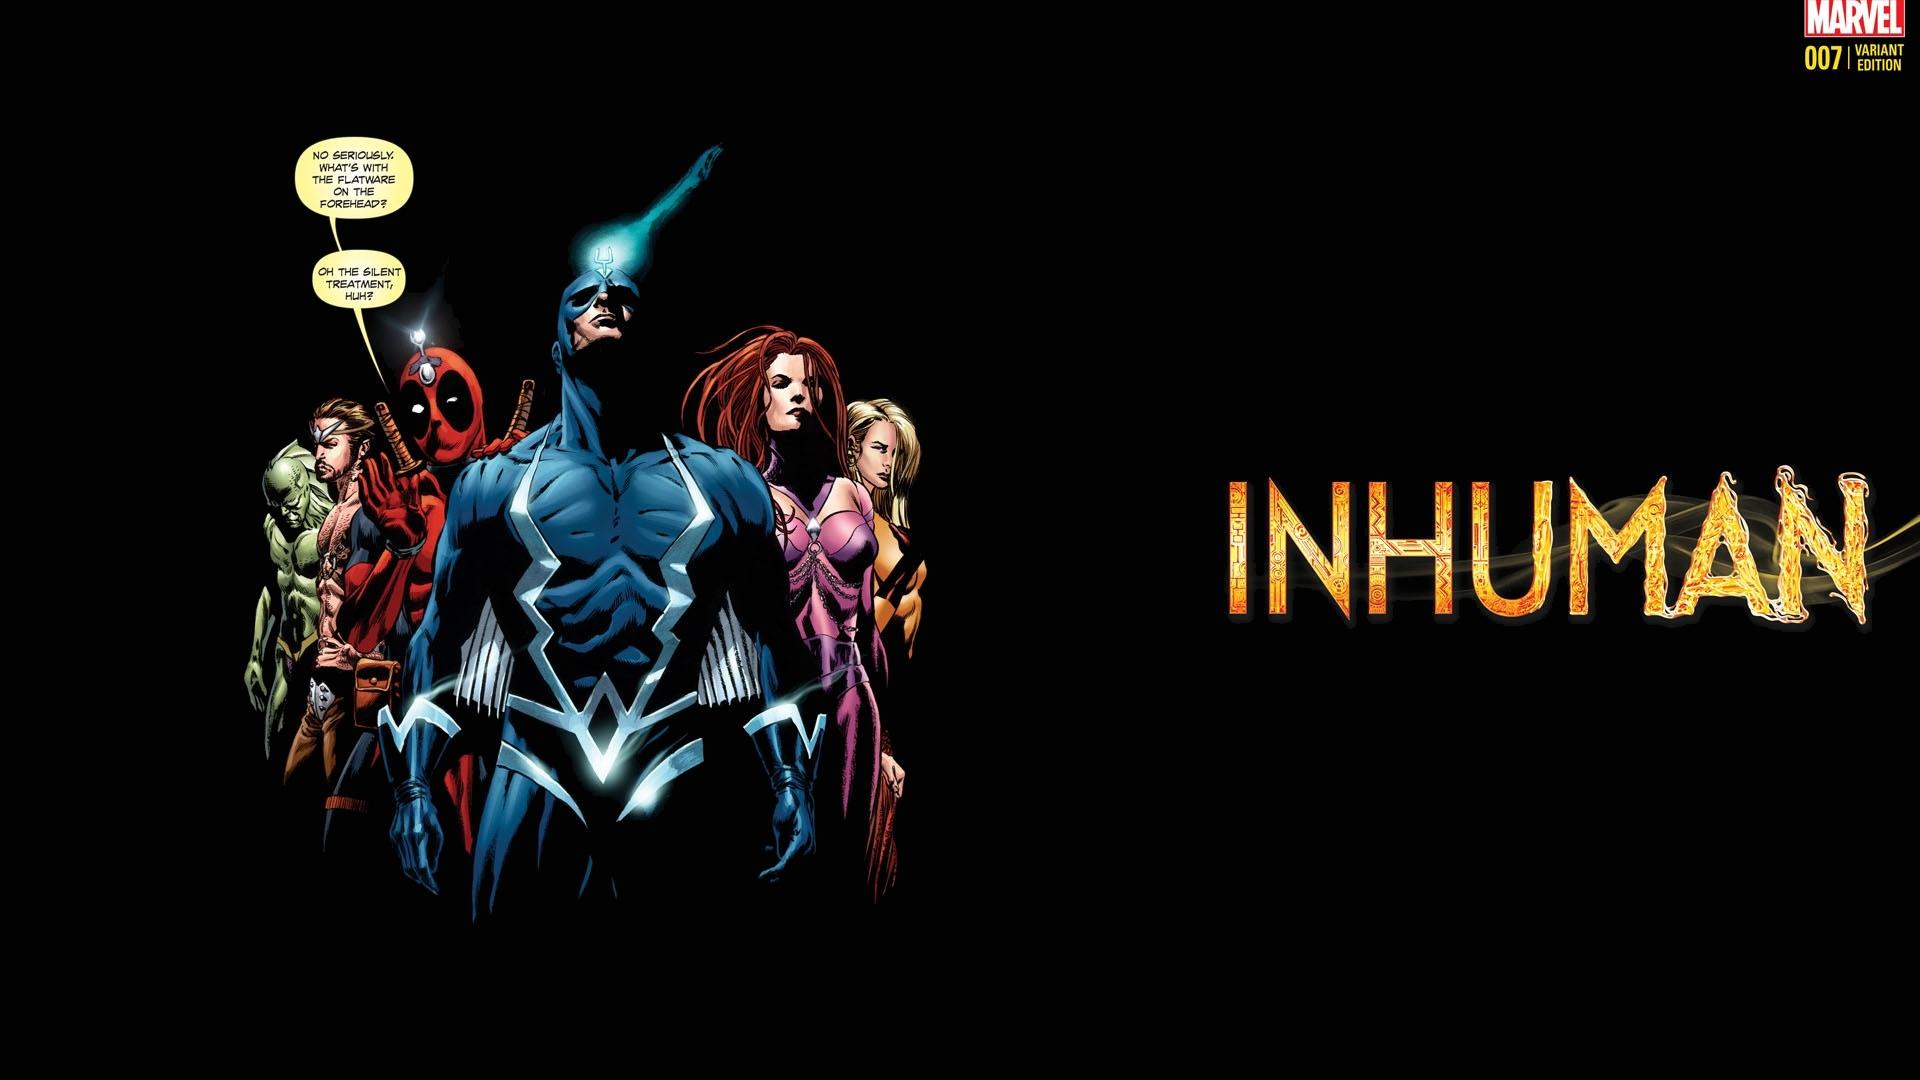 3 Inhuman HD Wallpapers | Backgrounds - Wallpaper Abyss